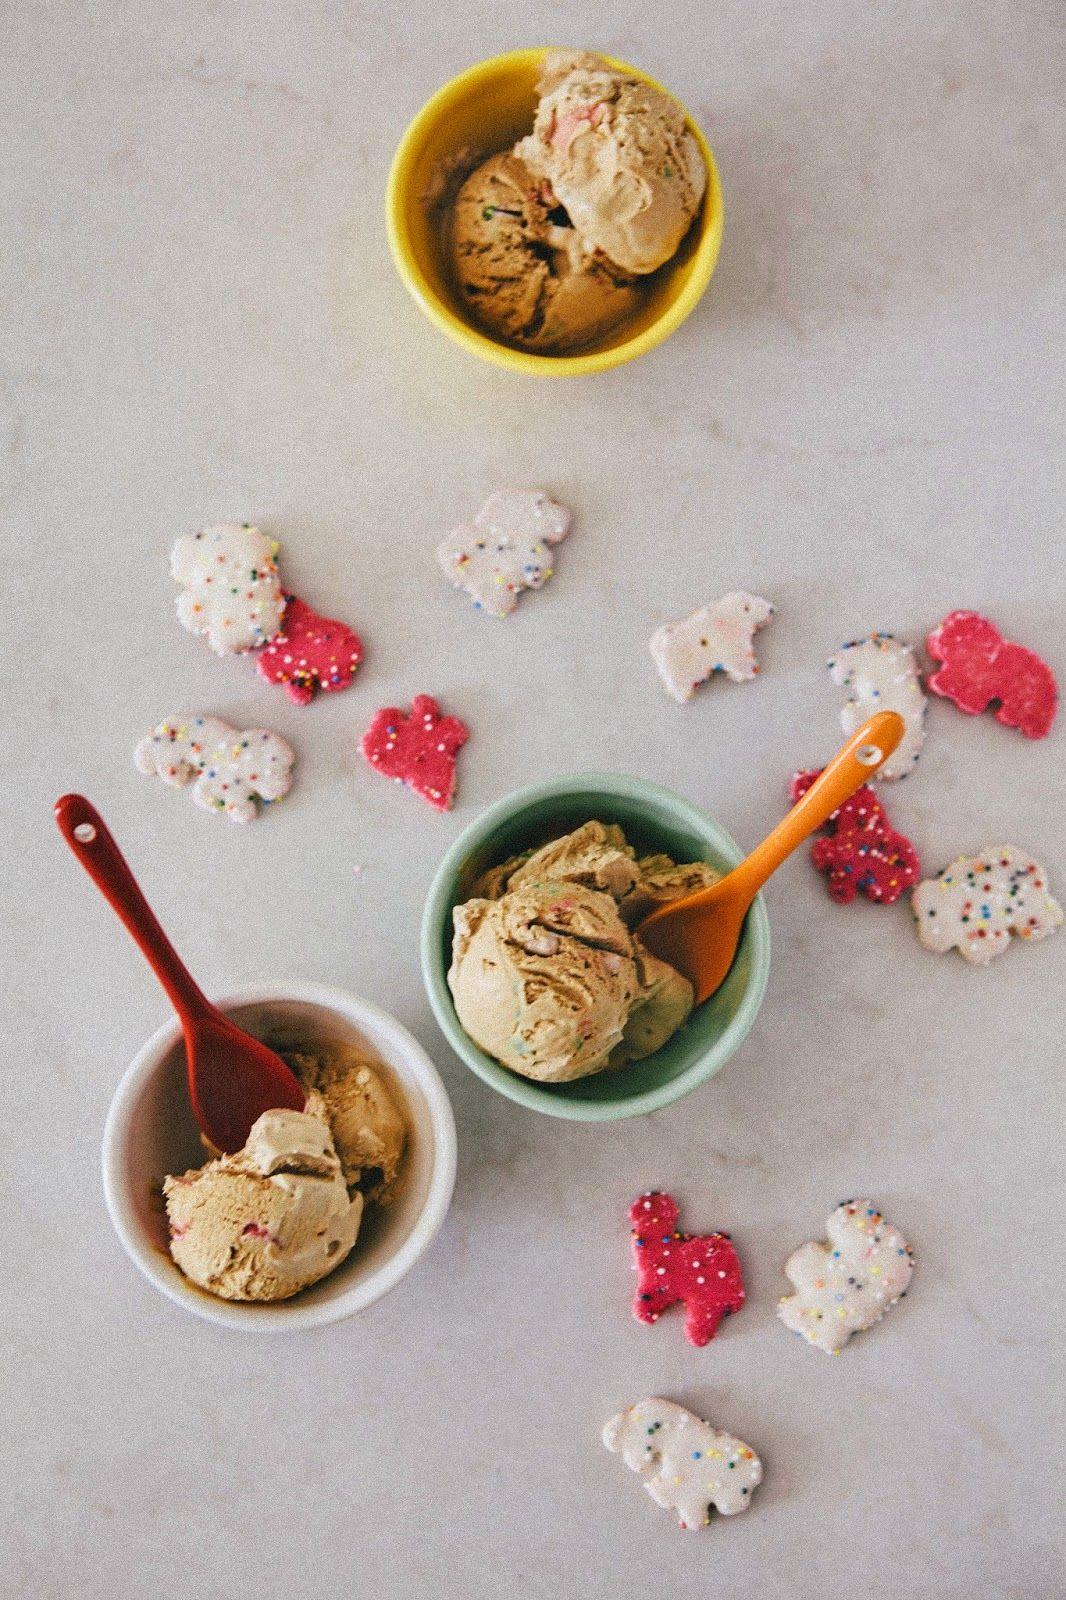 Coffee ice cream with circus animals.